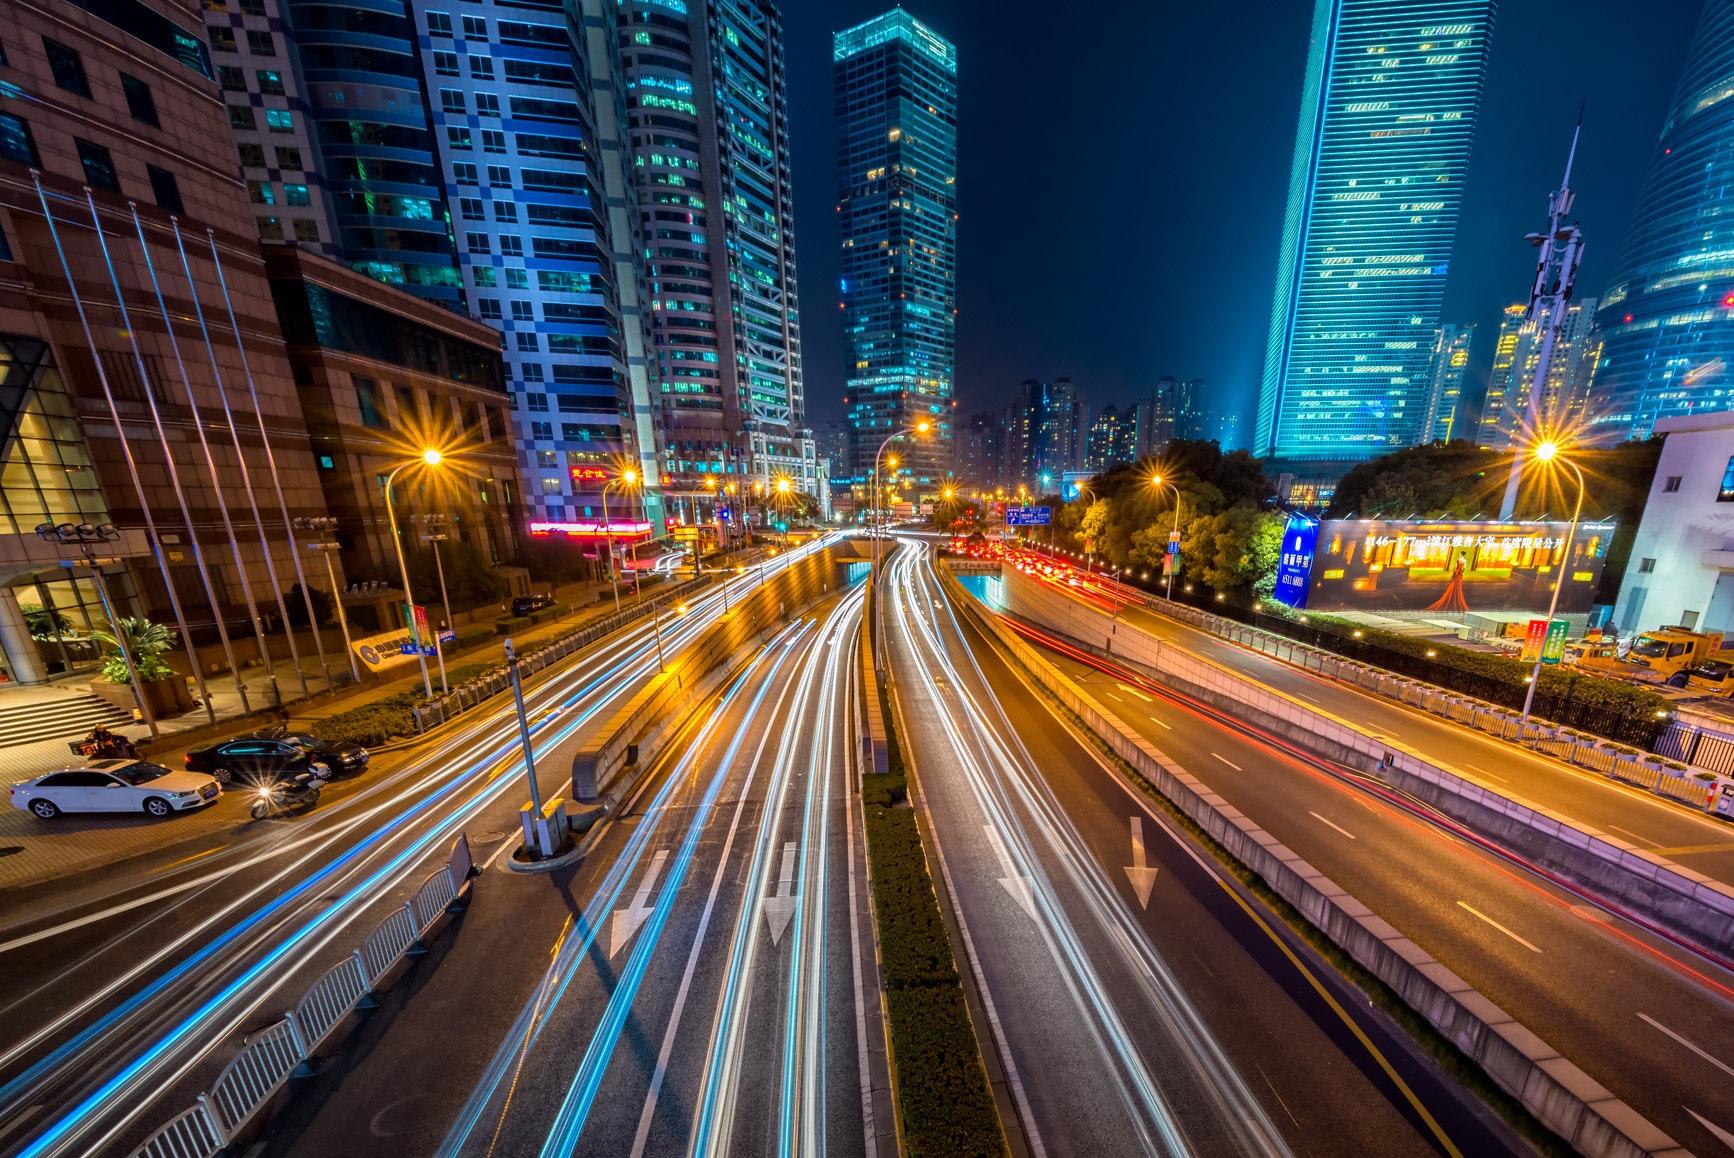 buildings-cars-city-169677